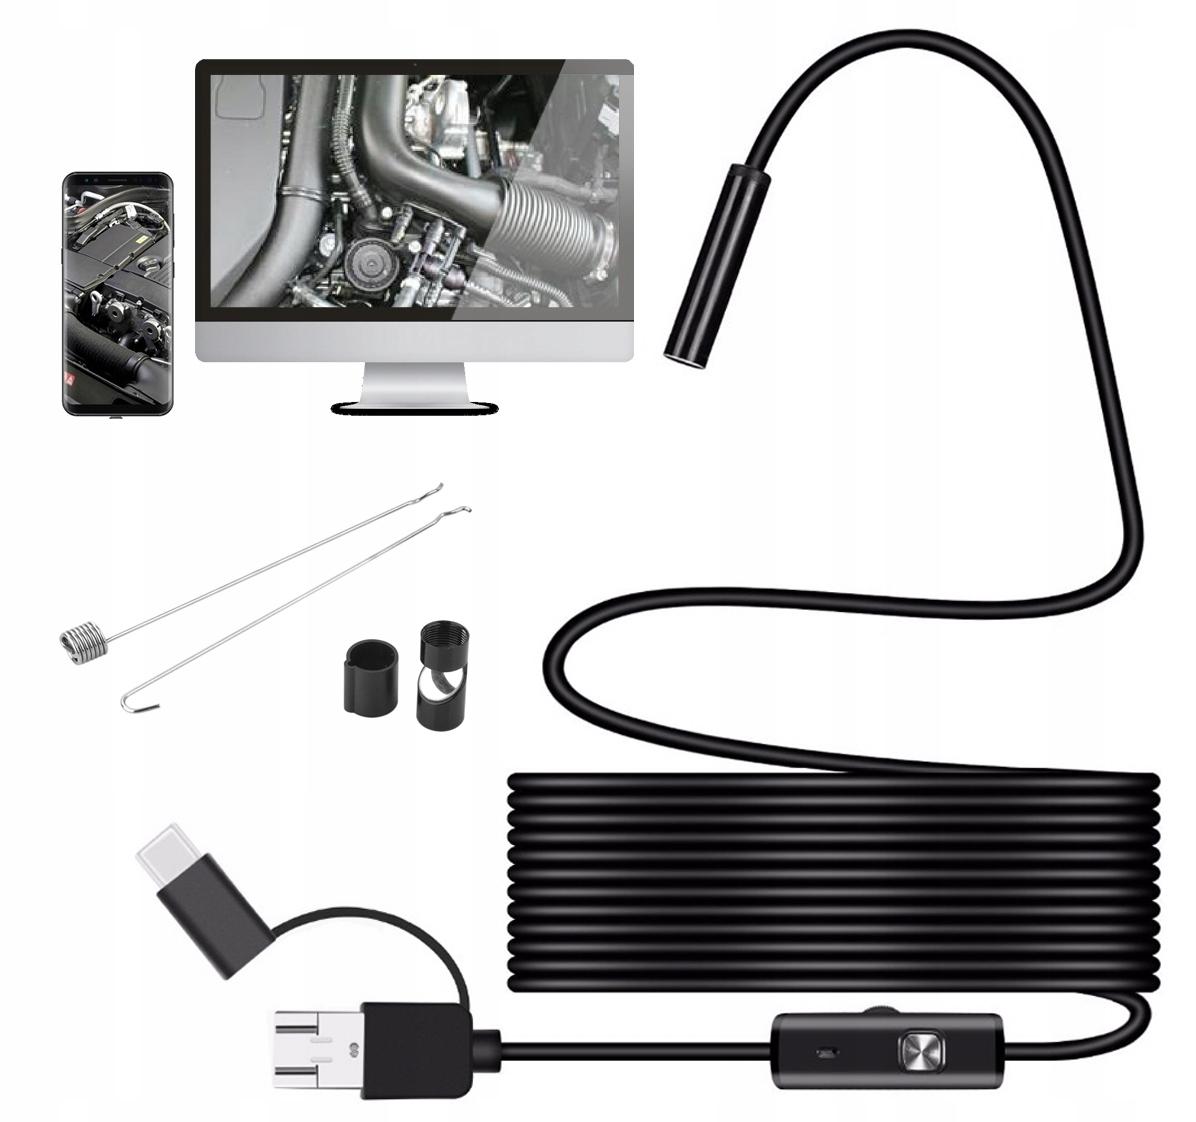 ENDOSKOP Kamera INSPEKCYJNA 5M 960p ANDROID USB C